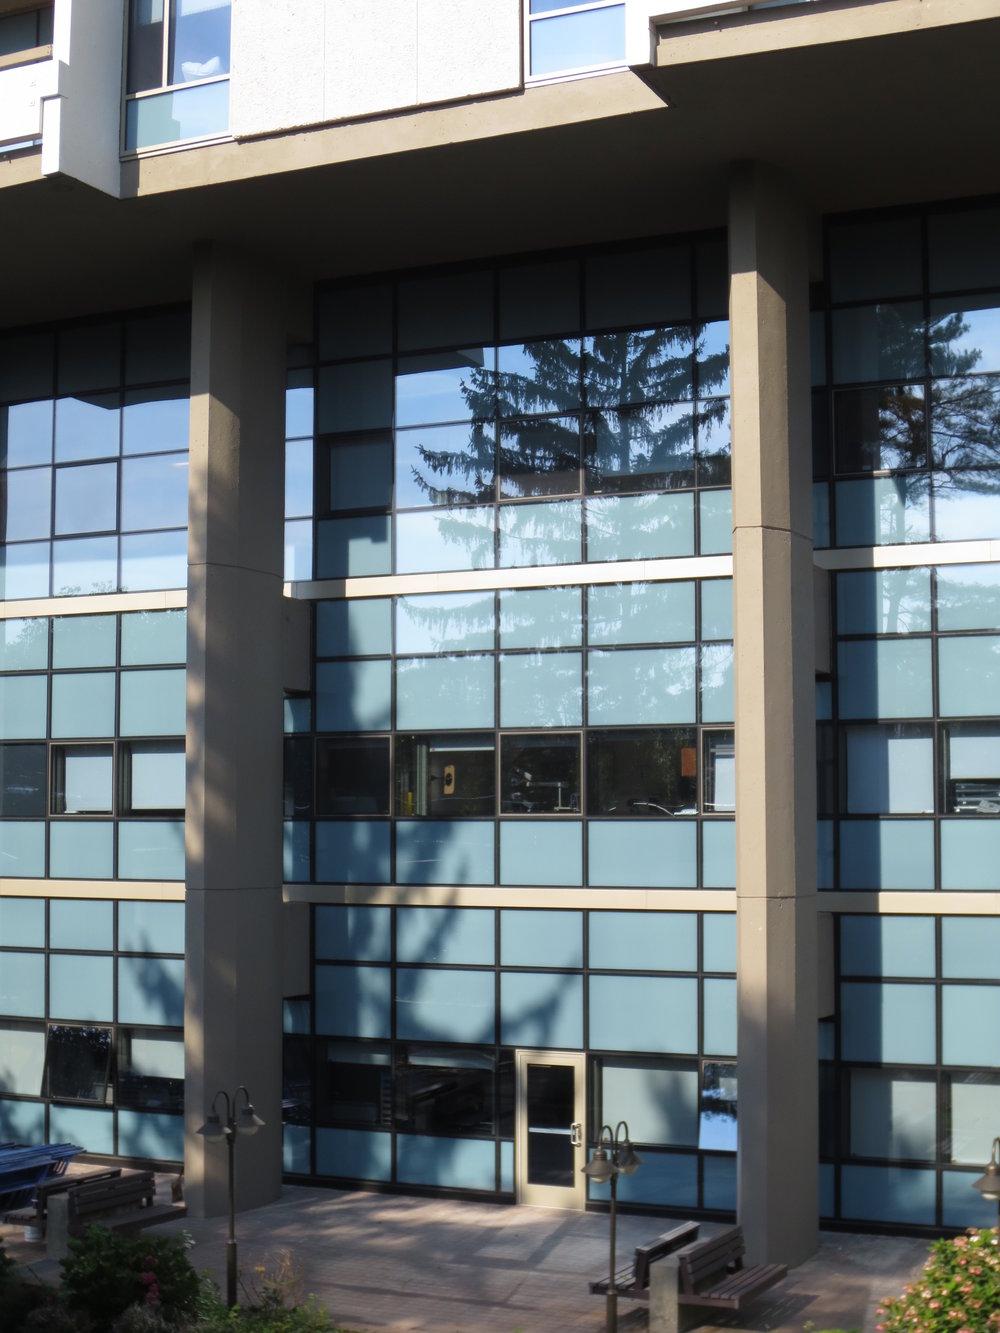 Parker Jewish Institute. Tobin Parnes Design. NY. Healthcare Design. Exterior. Facade.